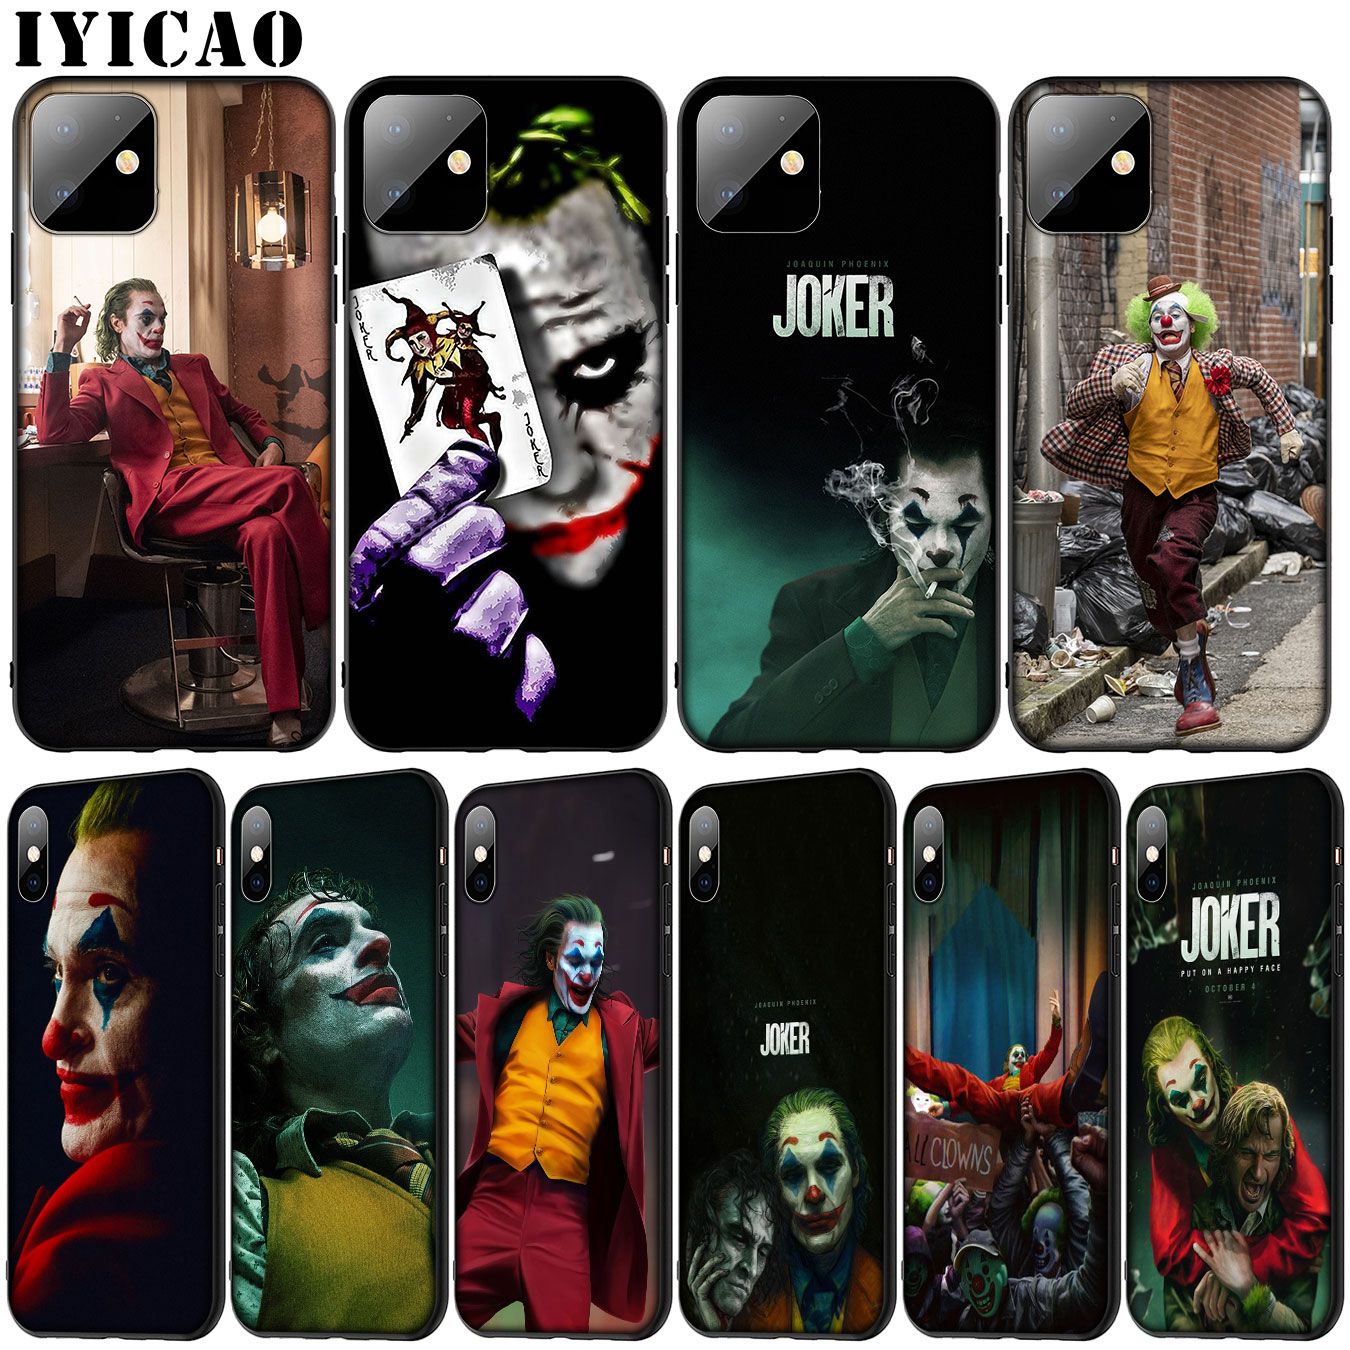 joker Joaquin Phoenix Soft Silicone Cover Case for iPhone 11 Pro XR X XS Max 6 6S 7 8 Plus 5 5S SE Black Phone Case